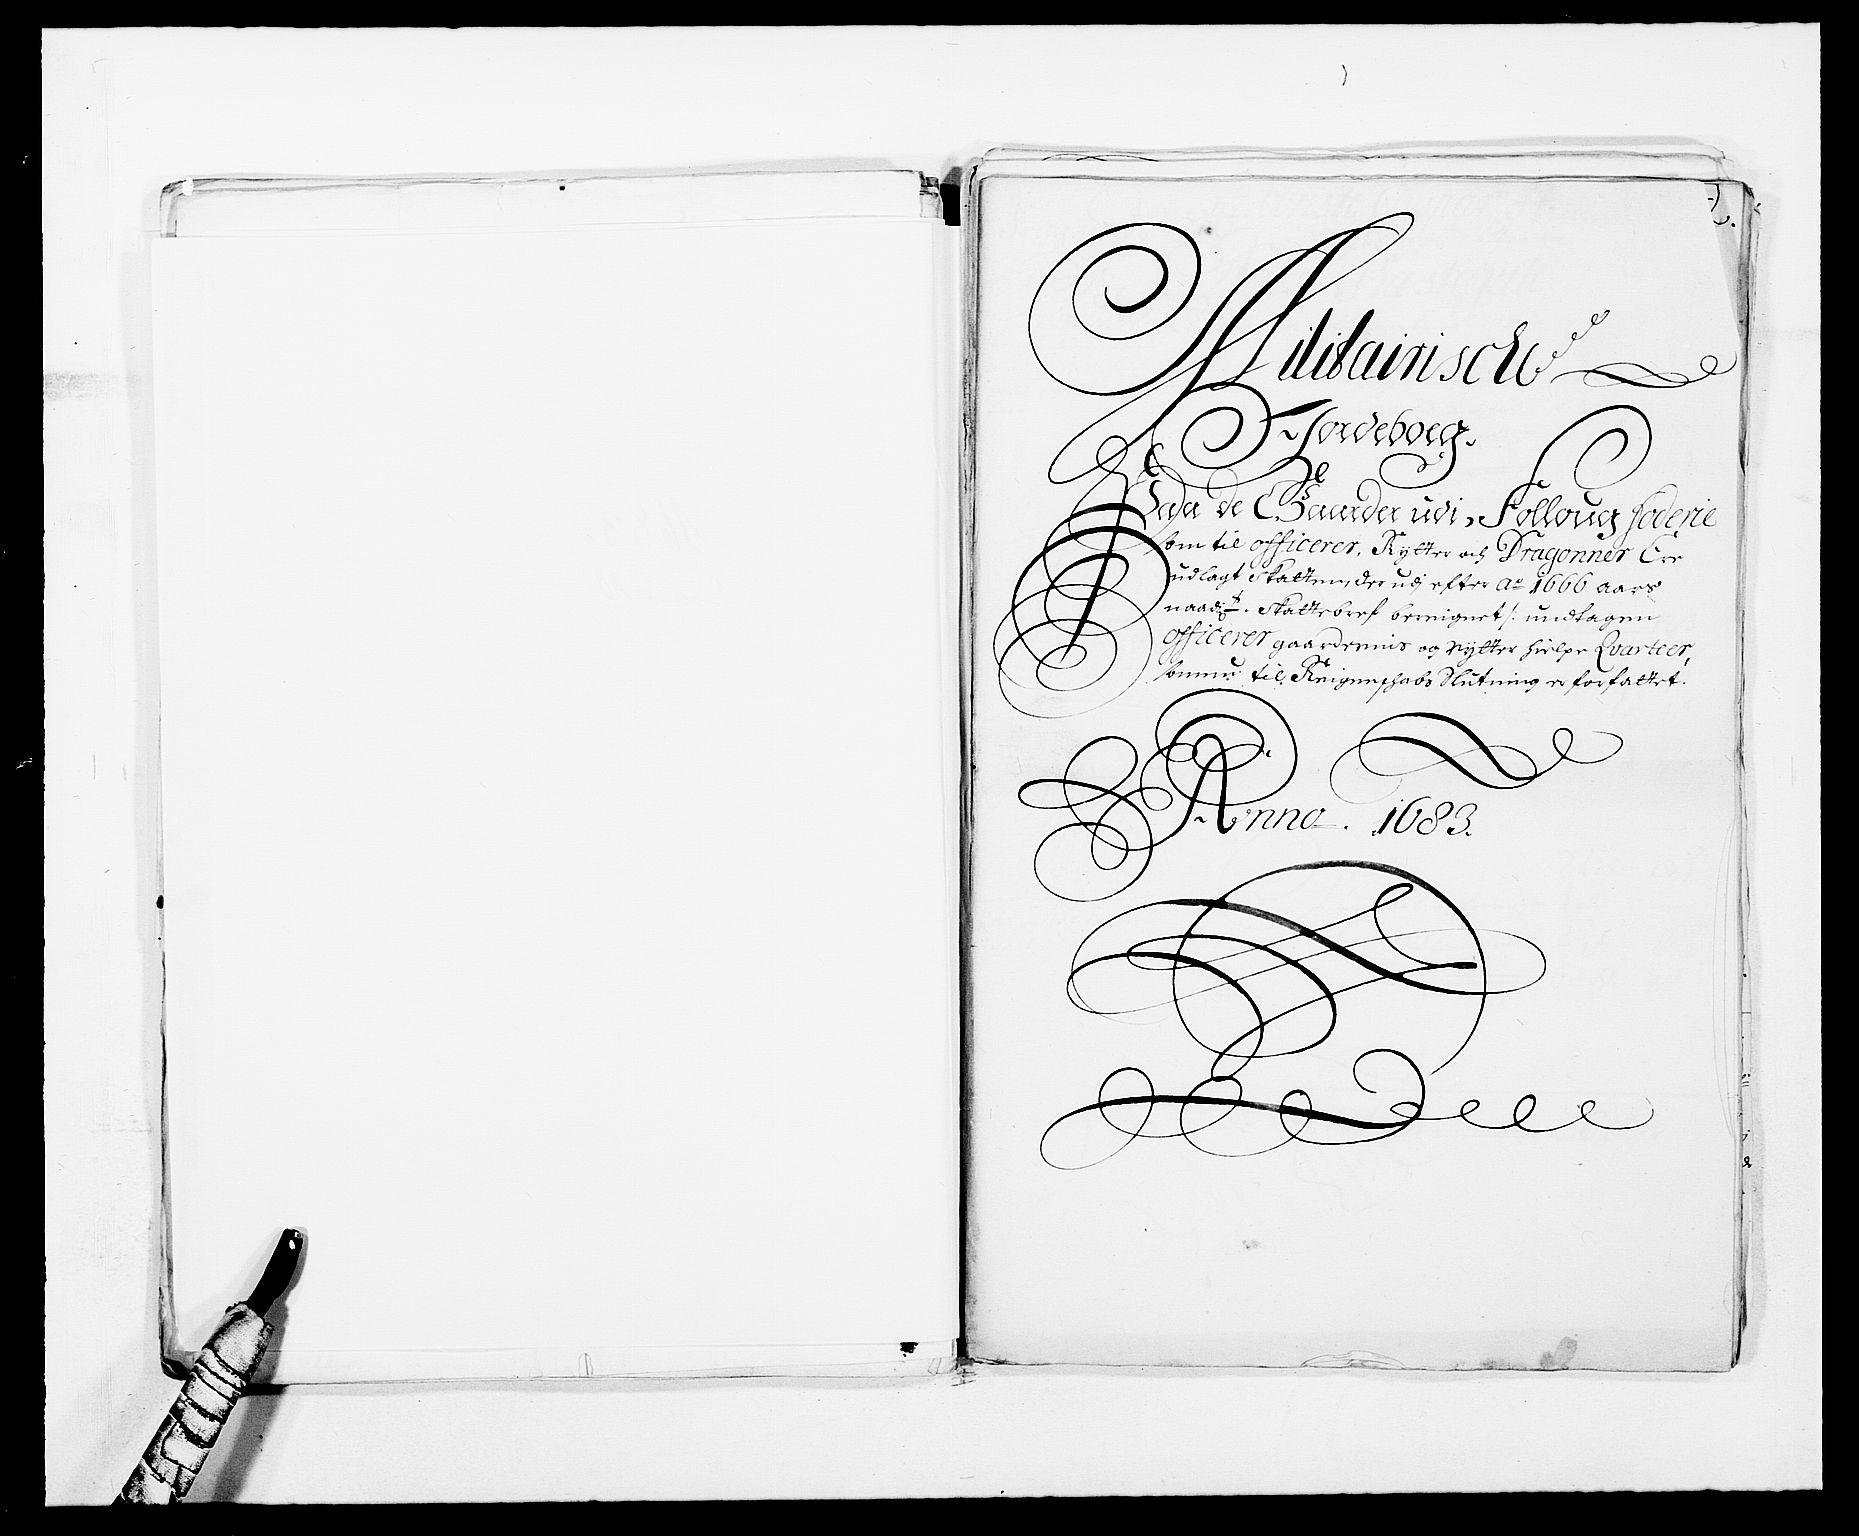 RA, Rentekammeret inntil 1814, Reviderte regnskaper, Fogderegnskap, R09/L0432: Fogderegnskap Follo, 1680-1684, s. 93